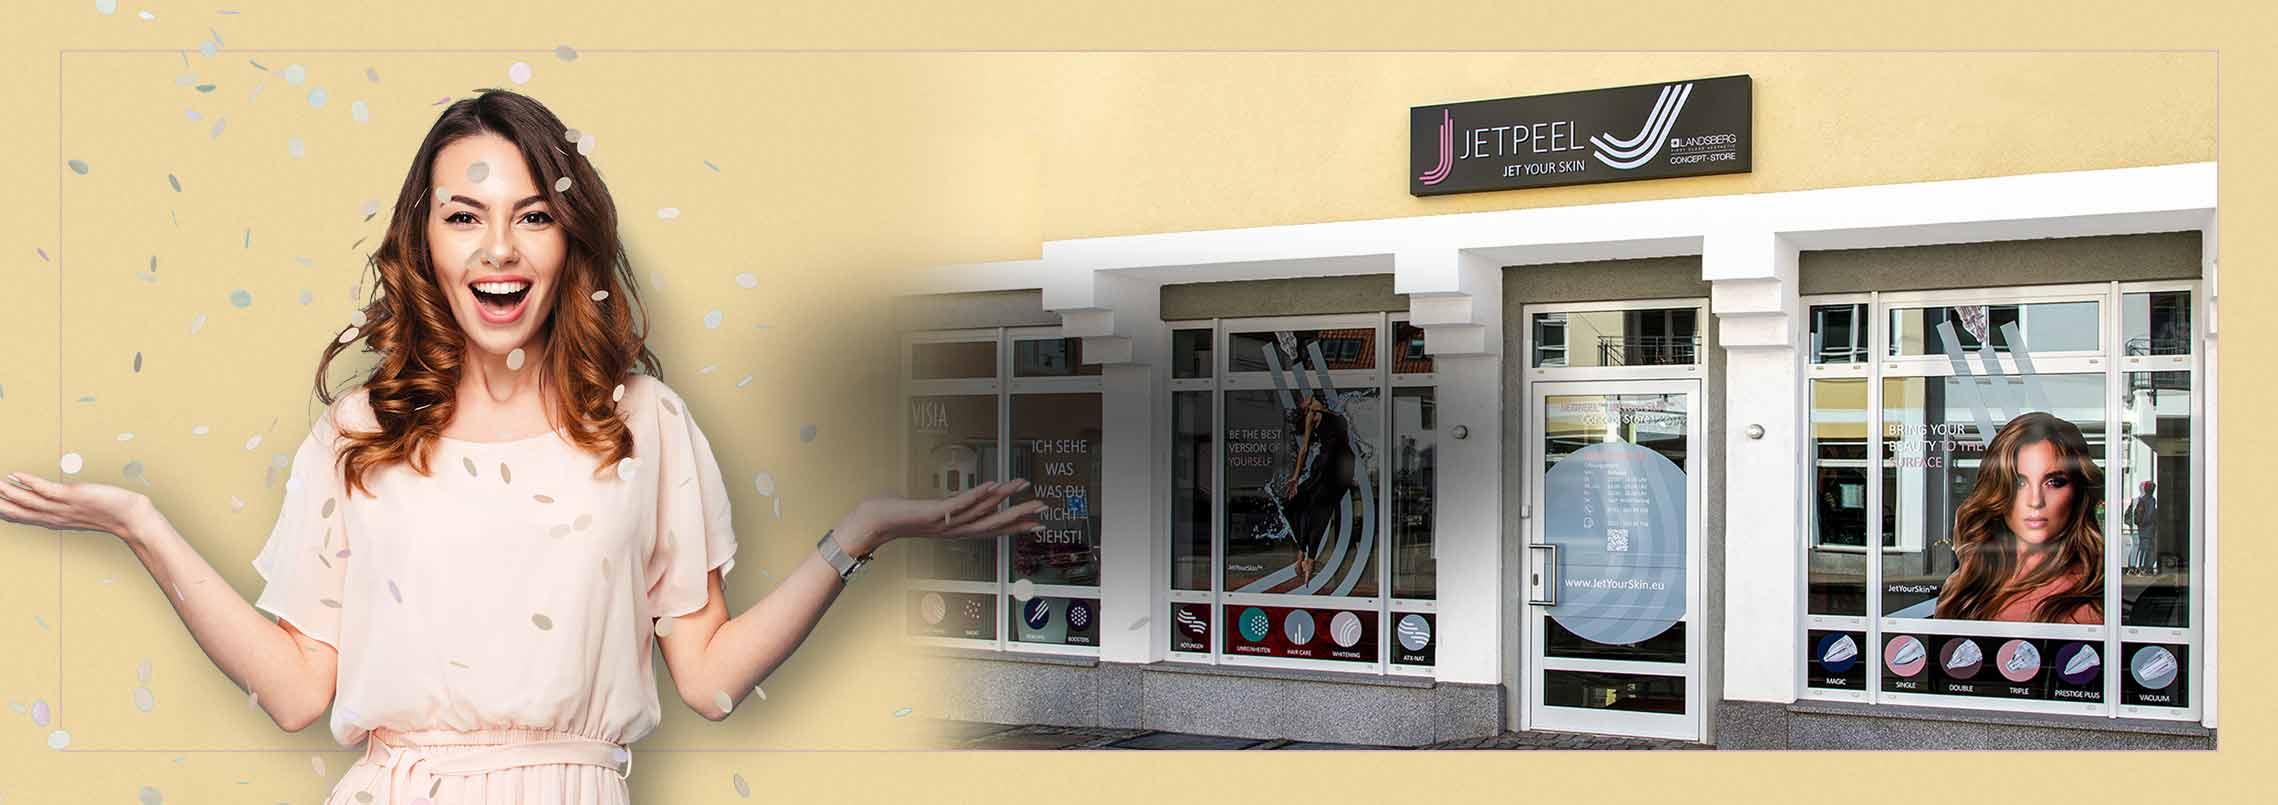 JetPeel-JetYourSkin-Landsberg-Concept-Store-Ulm-Slider